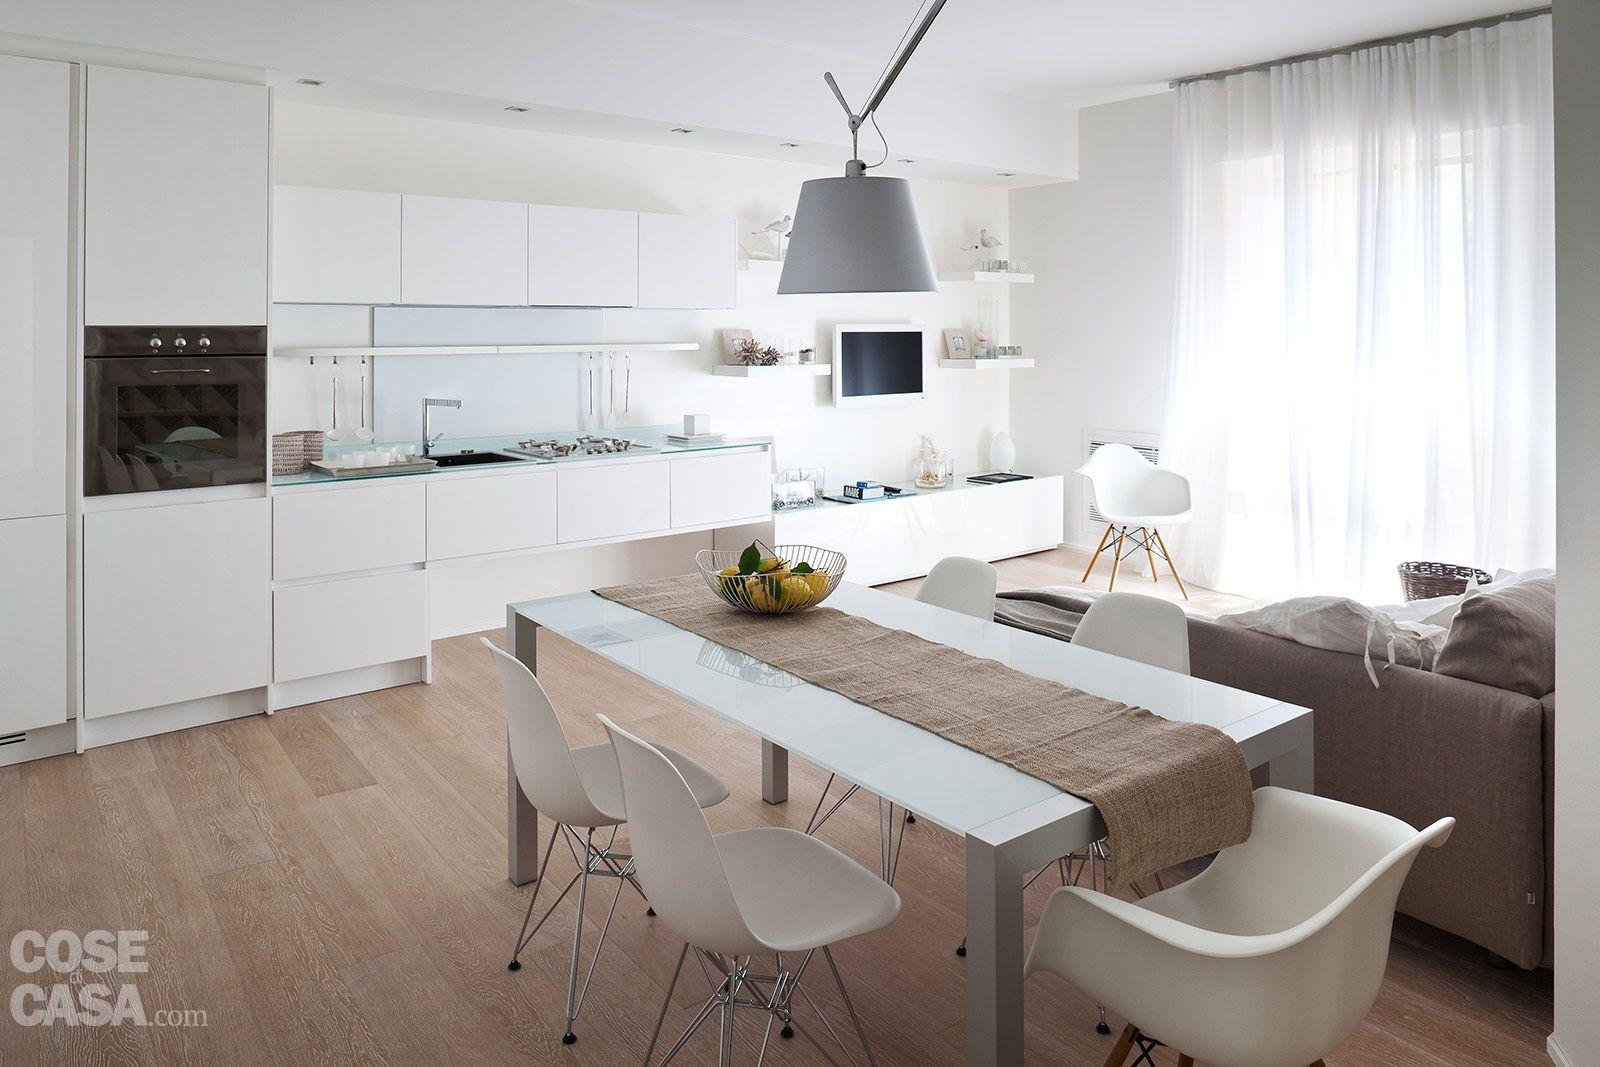 fiorentini-s-margherita-cucina2.jpg (1600×1067) | Cucine | Pinterest ...